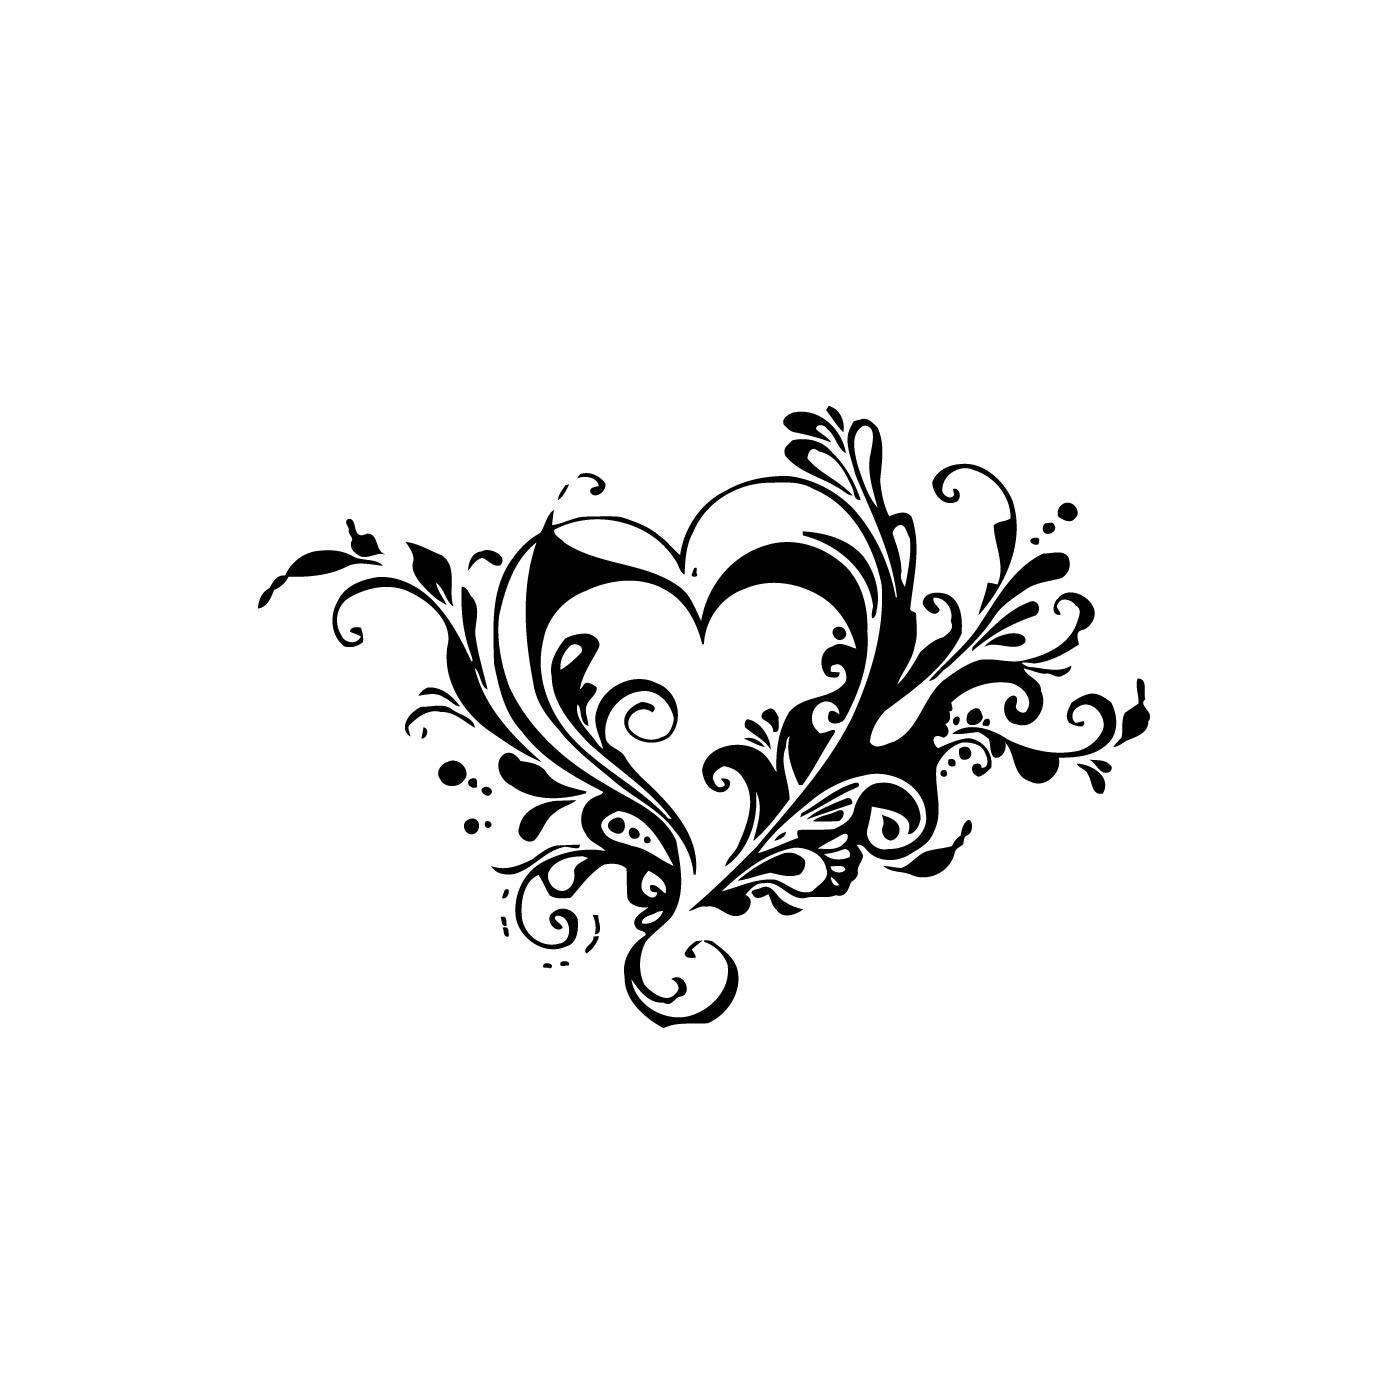 546bfee90 Tribal Flower And Heart Logo | Gardening: Flower and Vegetables